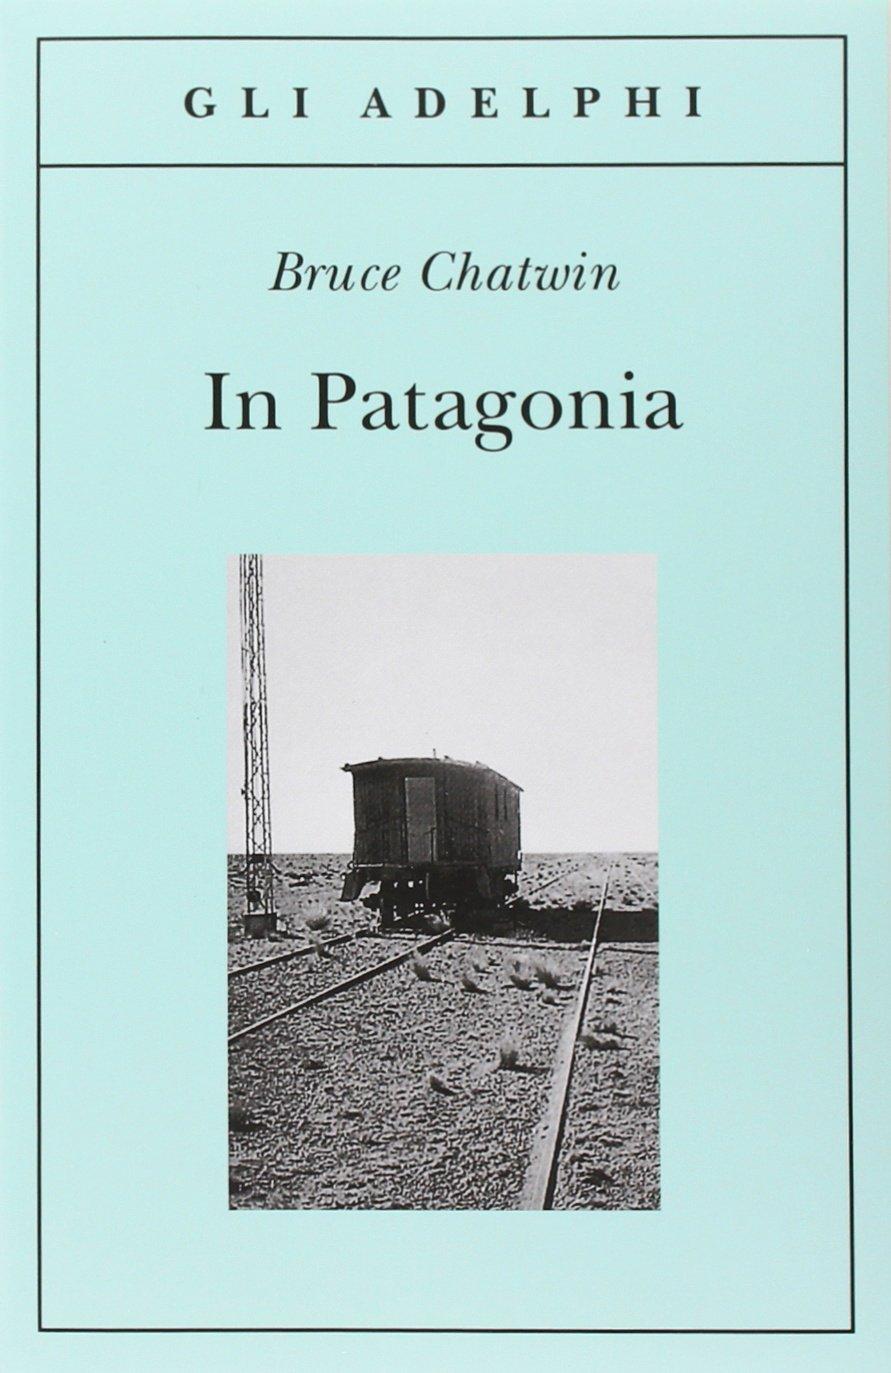 in patagonia libro